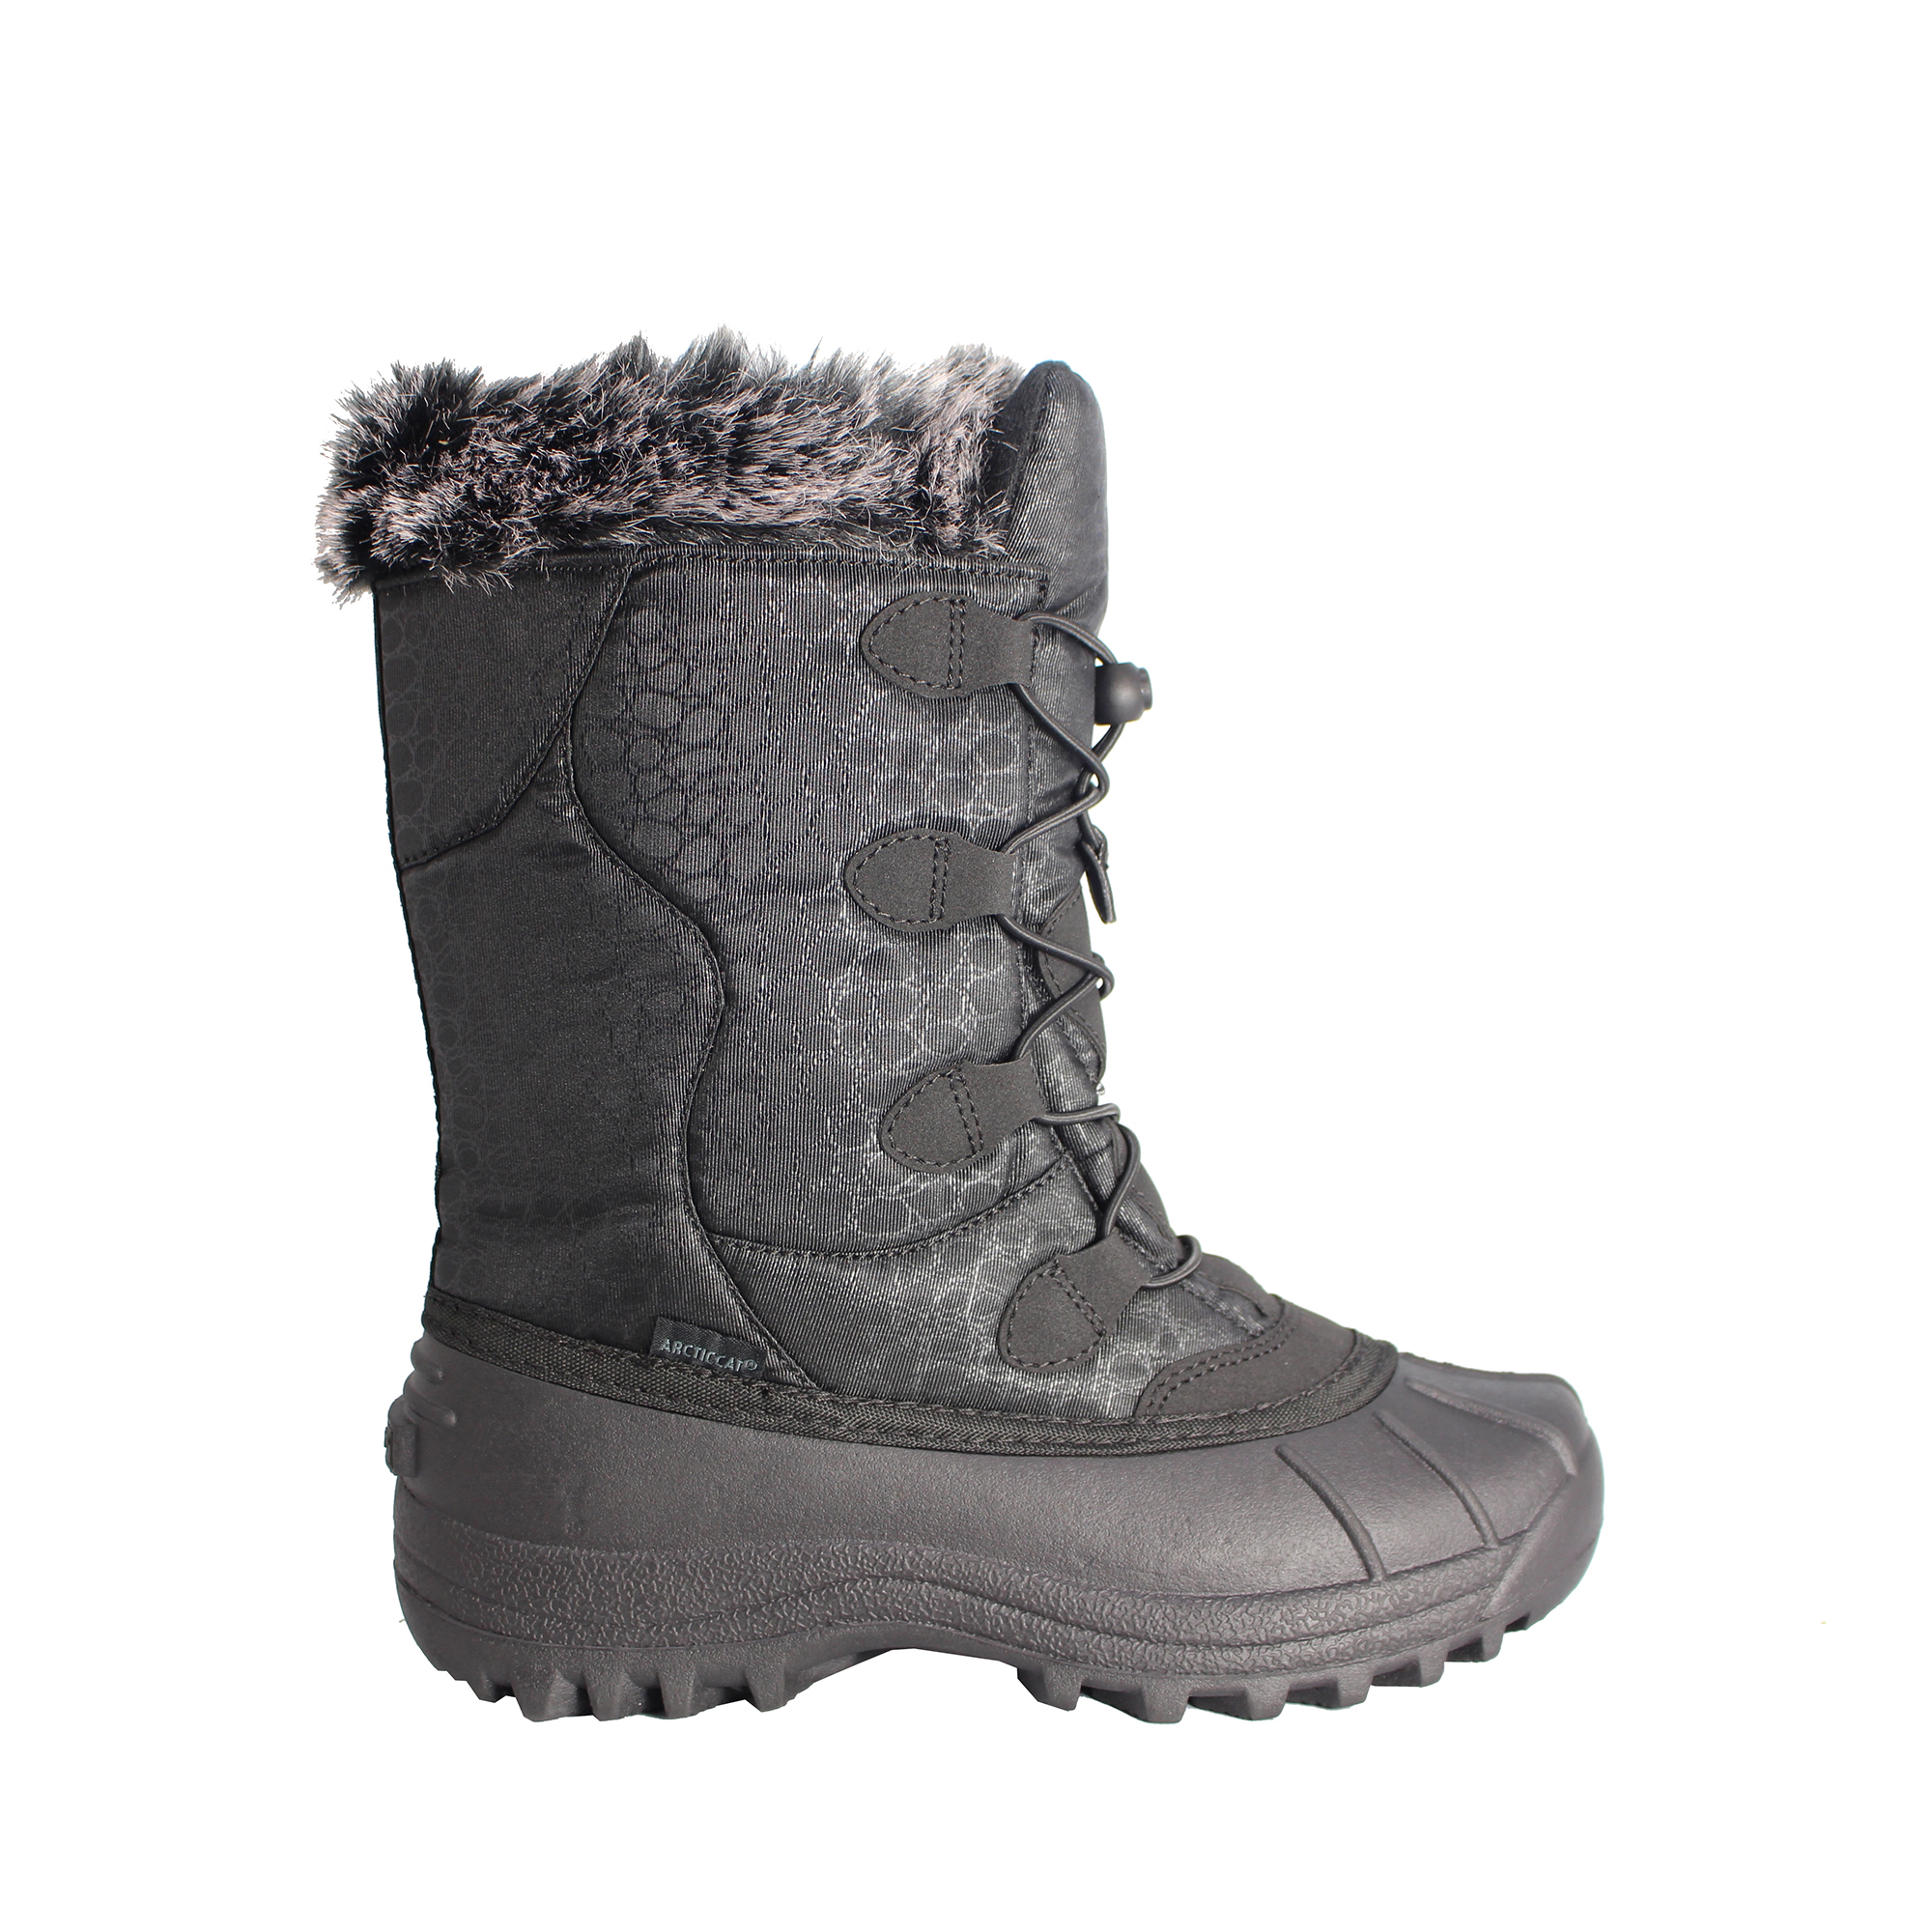 564d2caa30ae Arctic Cat - Arctic Cat Women s Warm Lined Waterproof Winter Boot -  Walmart.com